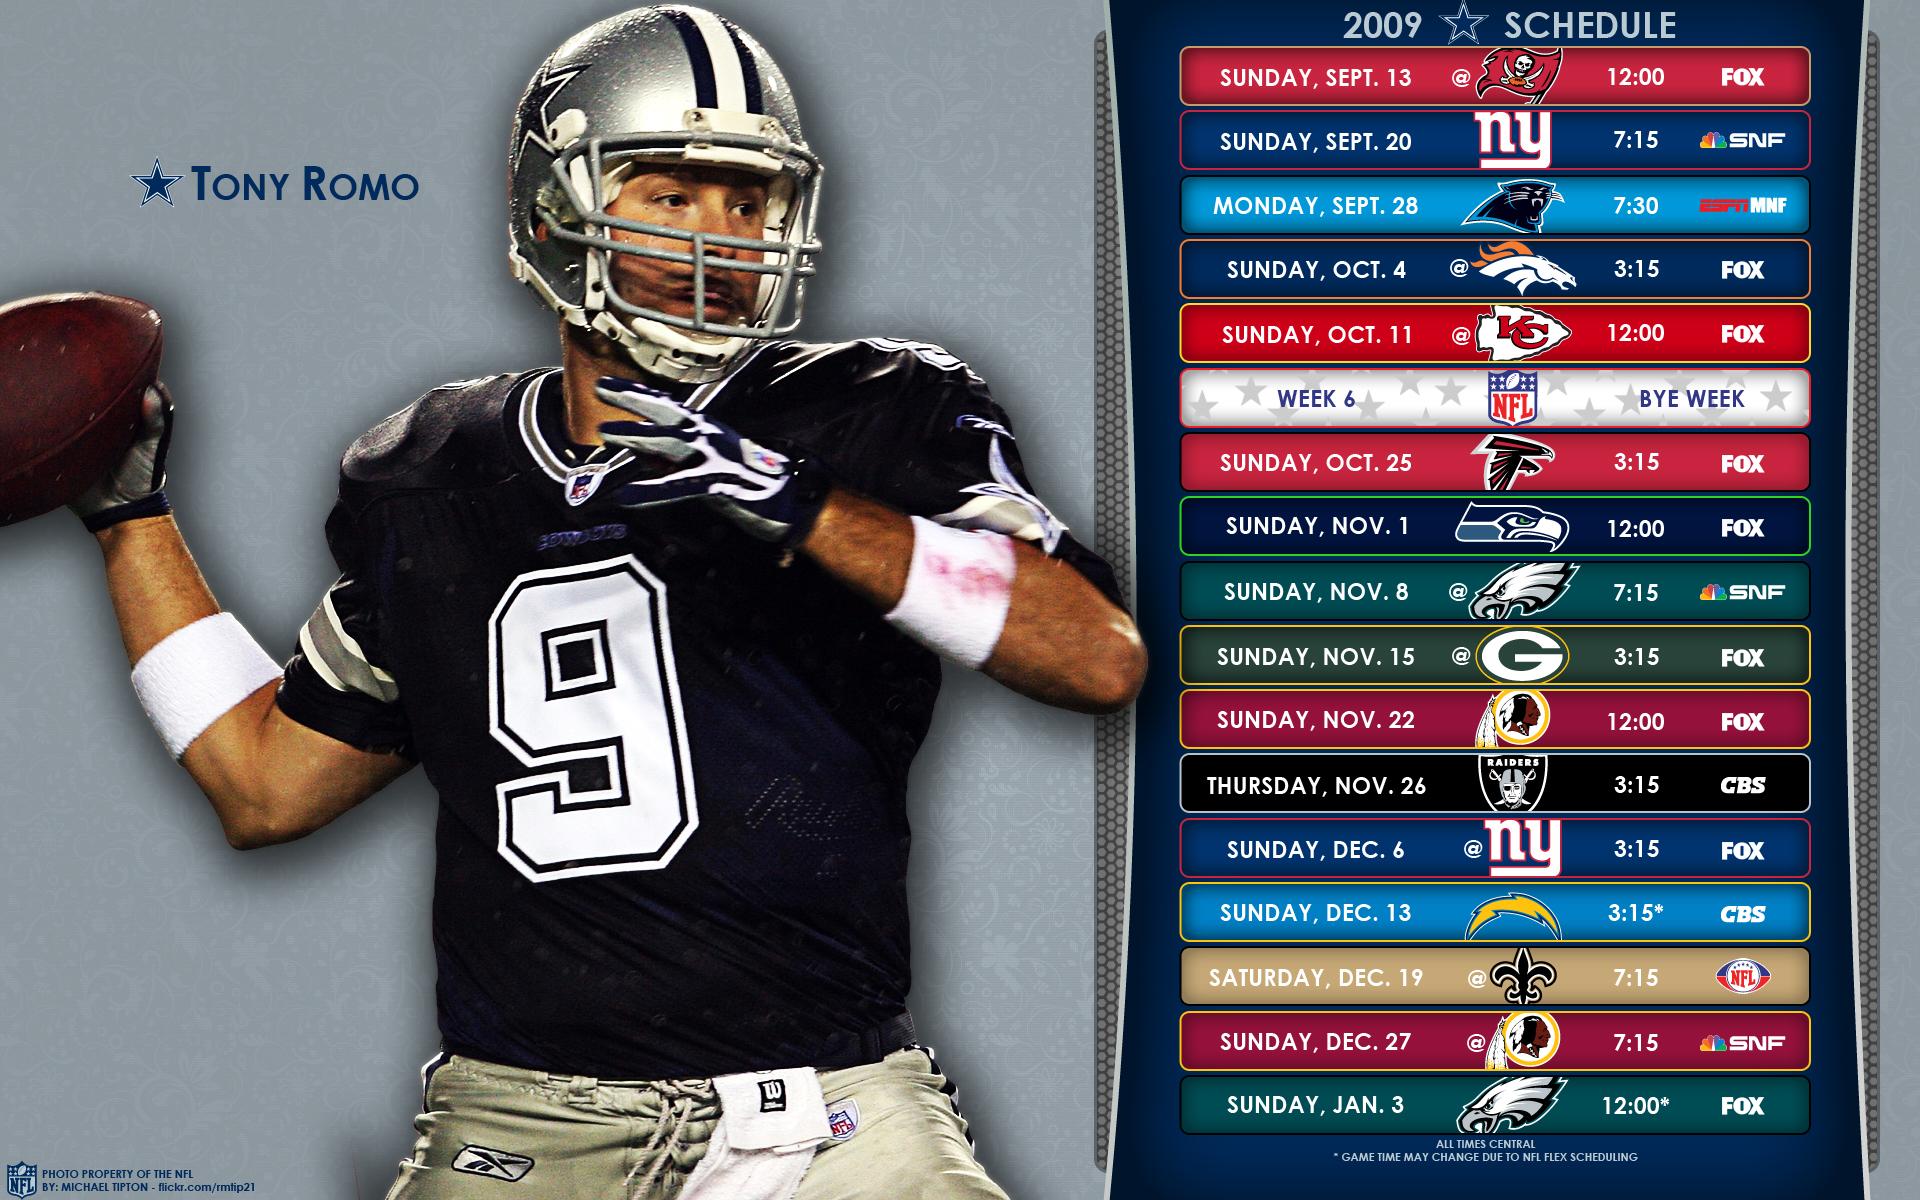 2009 Dallas Cowboys NFL Schedule Wallpaper | Explore ...